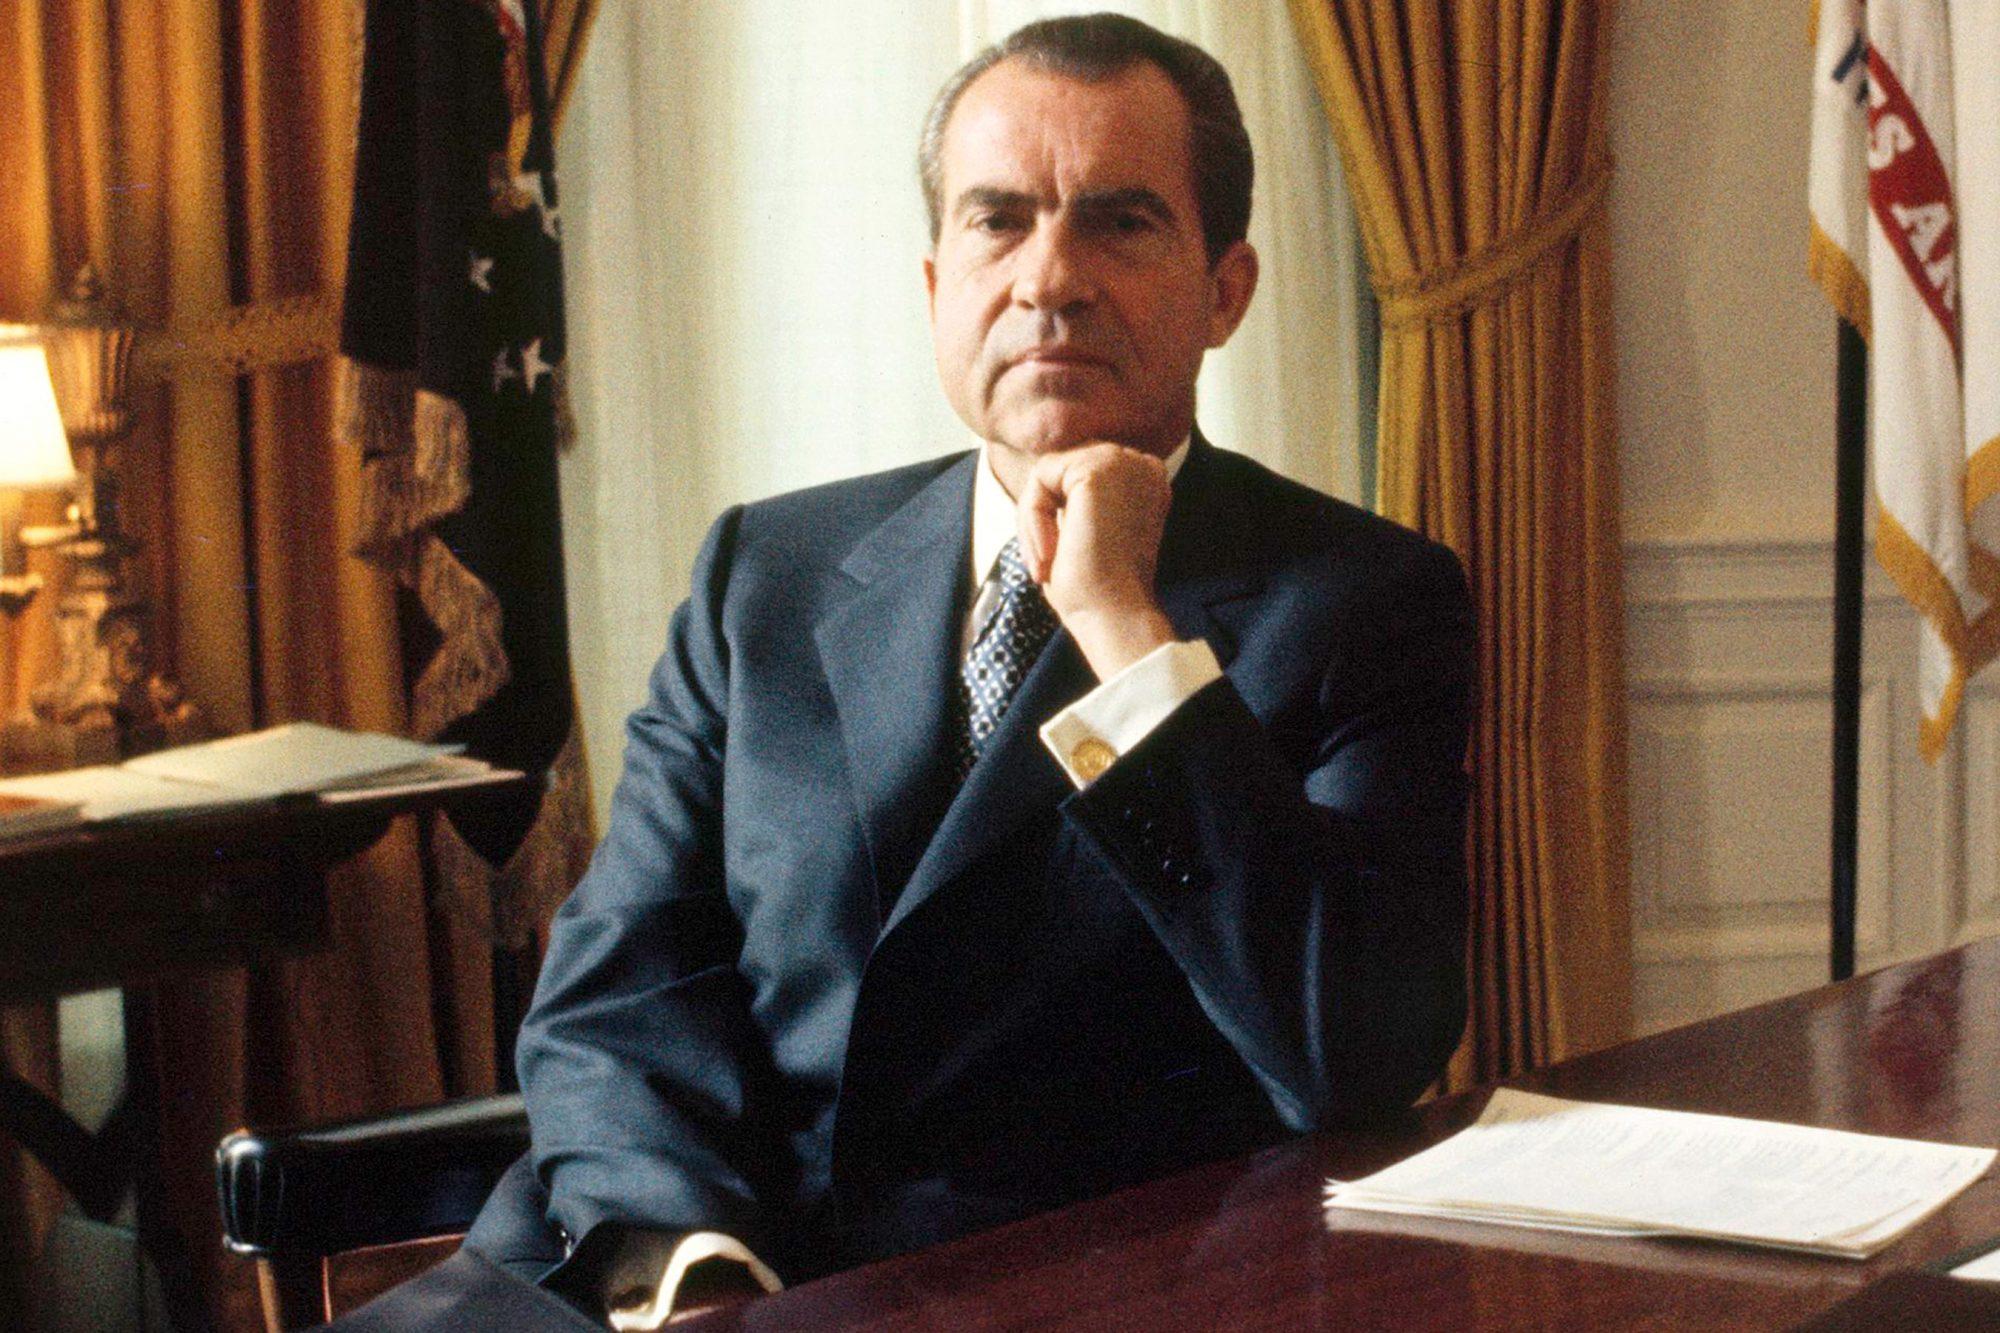 Richard Nixon In United States In The 1970S -